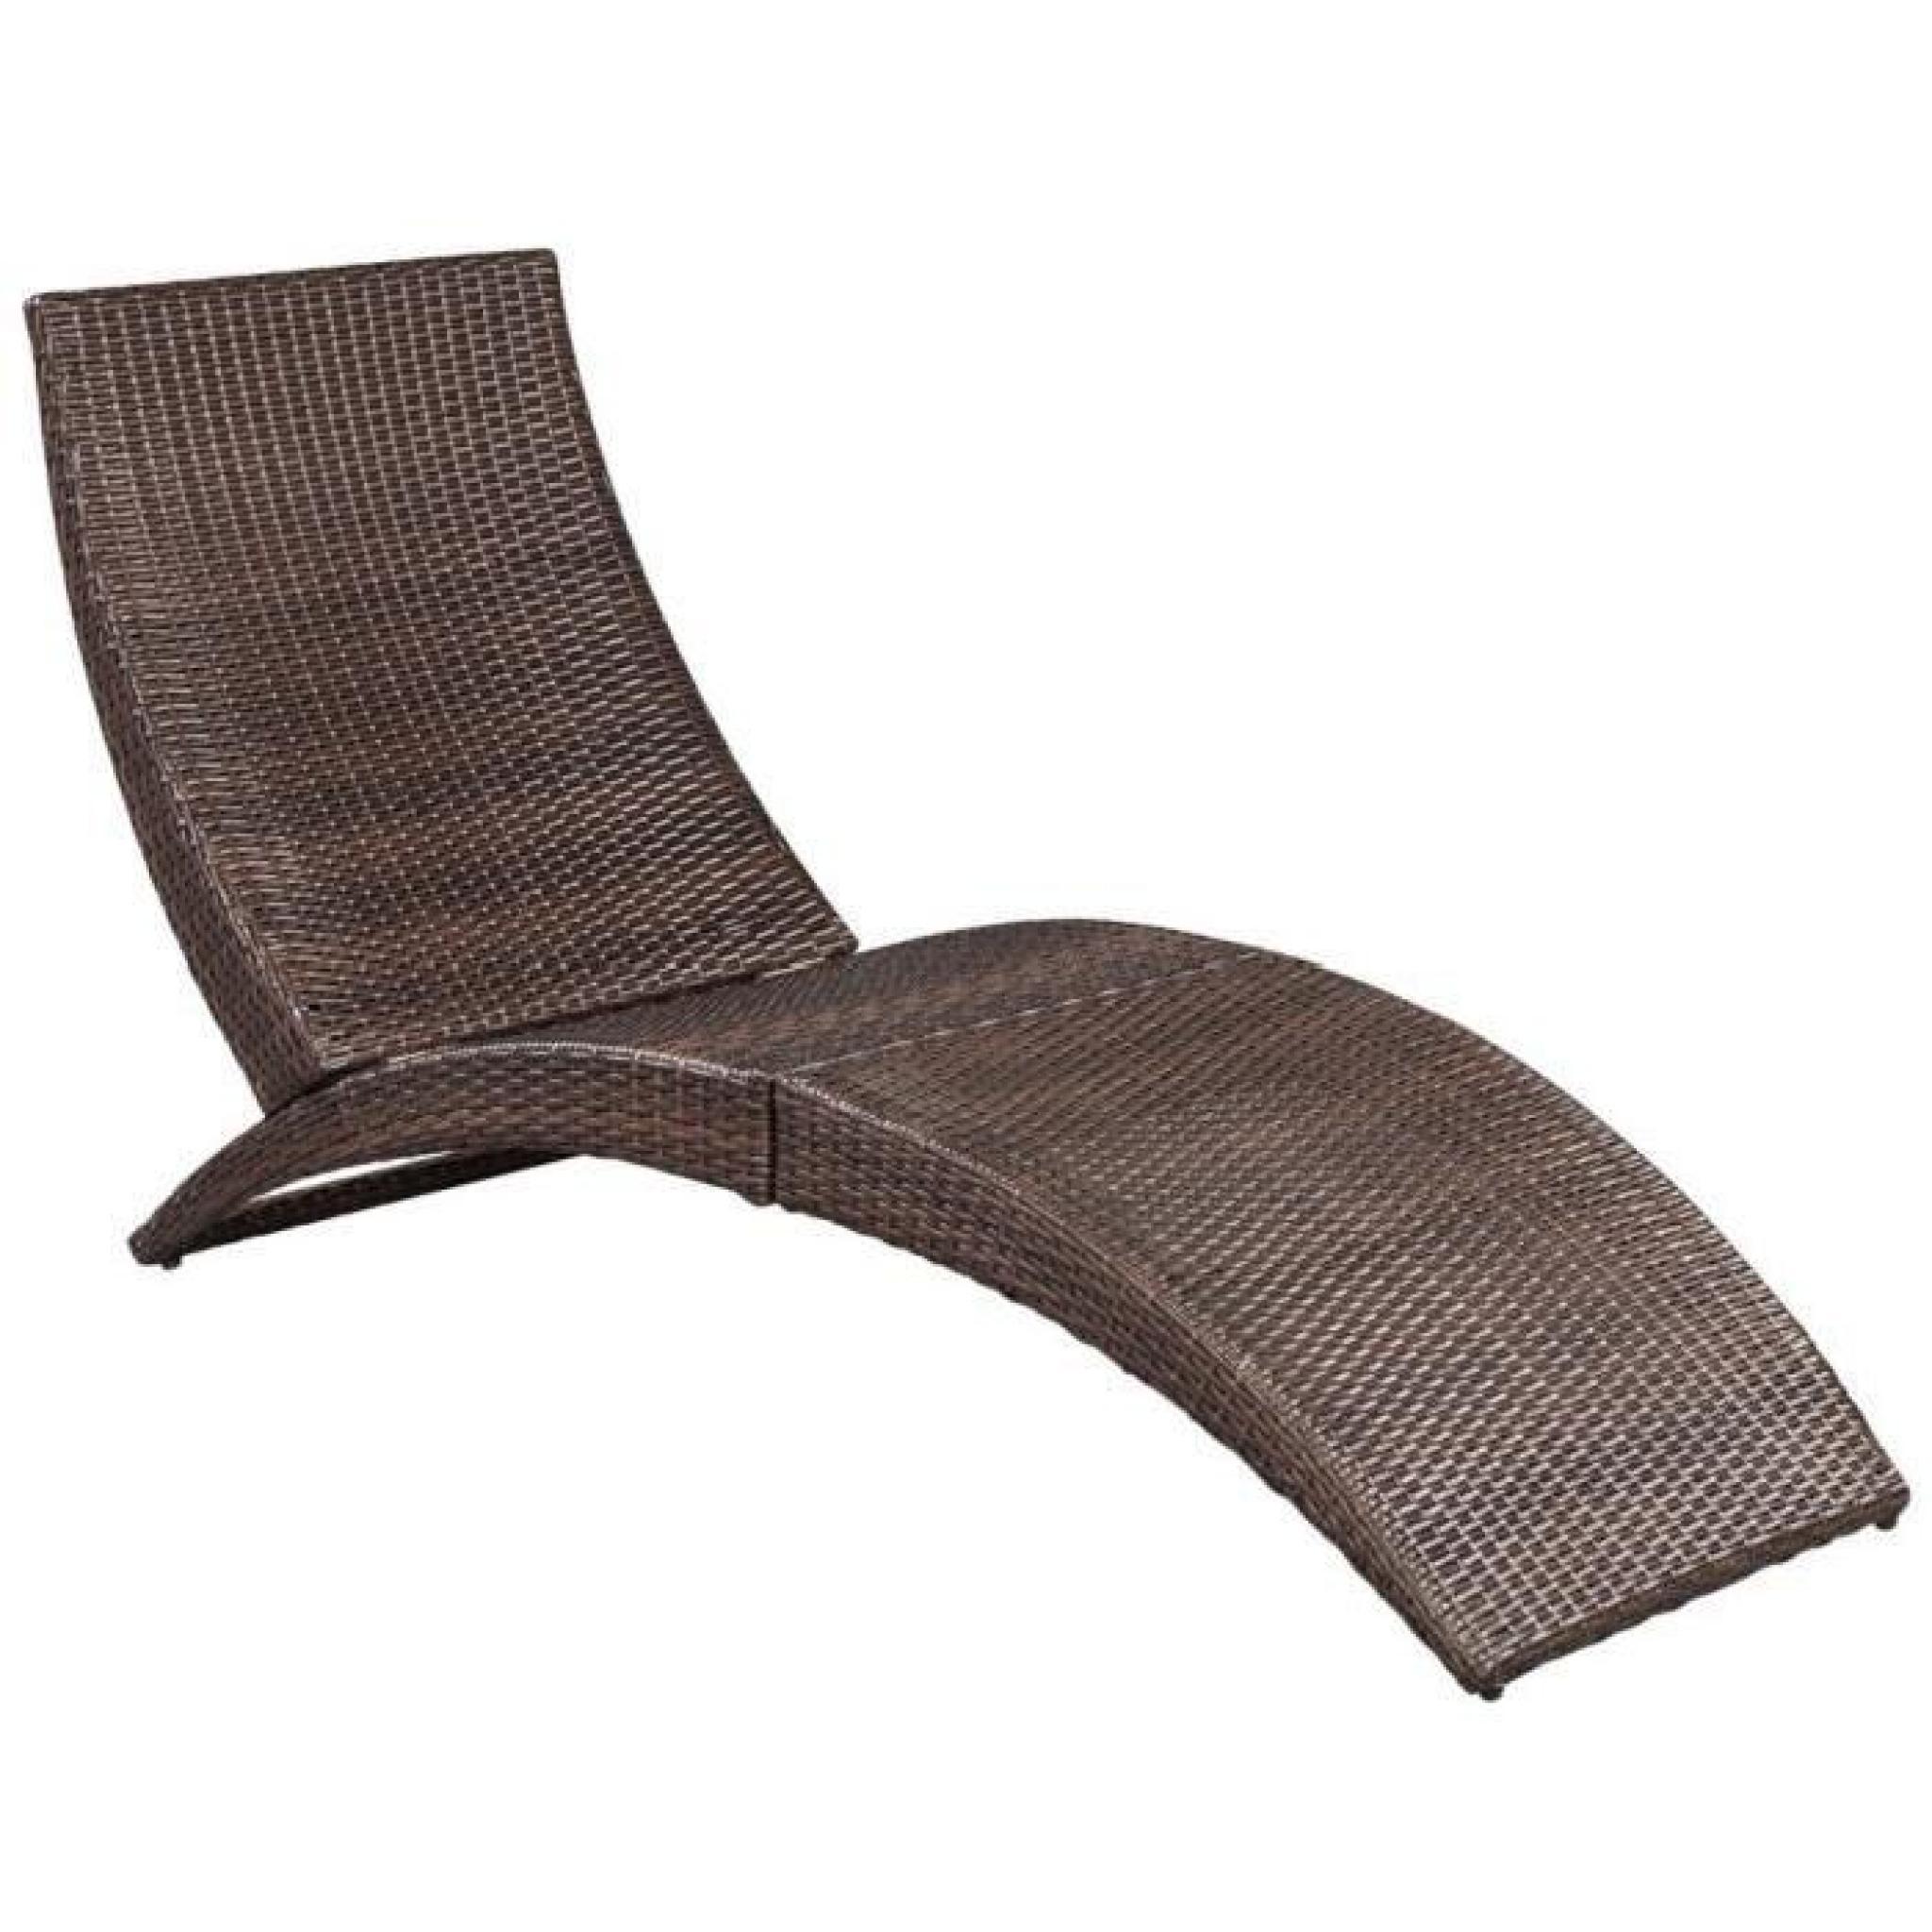 Chaise Longue Pliable Avec Coussin En Poly Rotin Marron